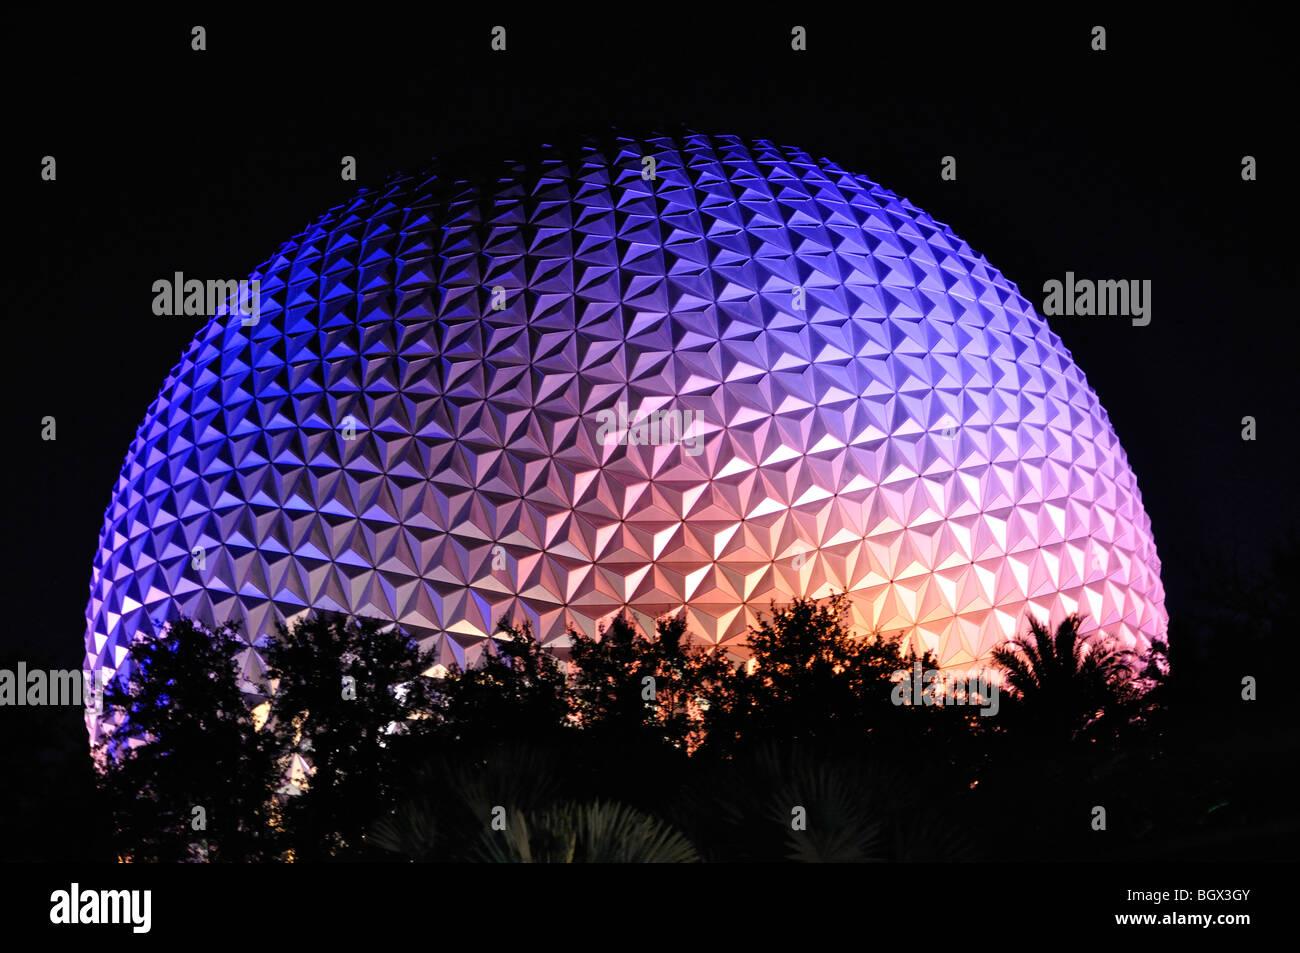 Spaceship Earth at night, Disneyworld, Orlando, Florida, USA - Stock Image